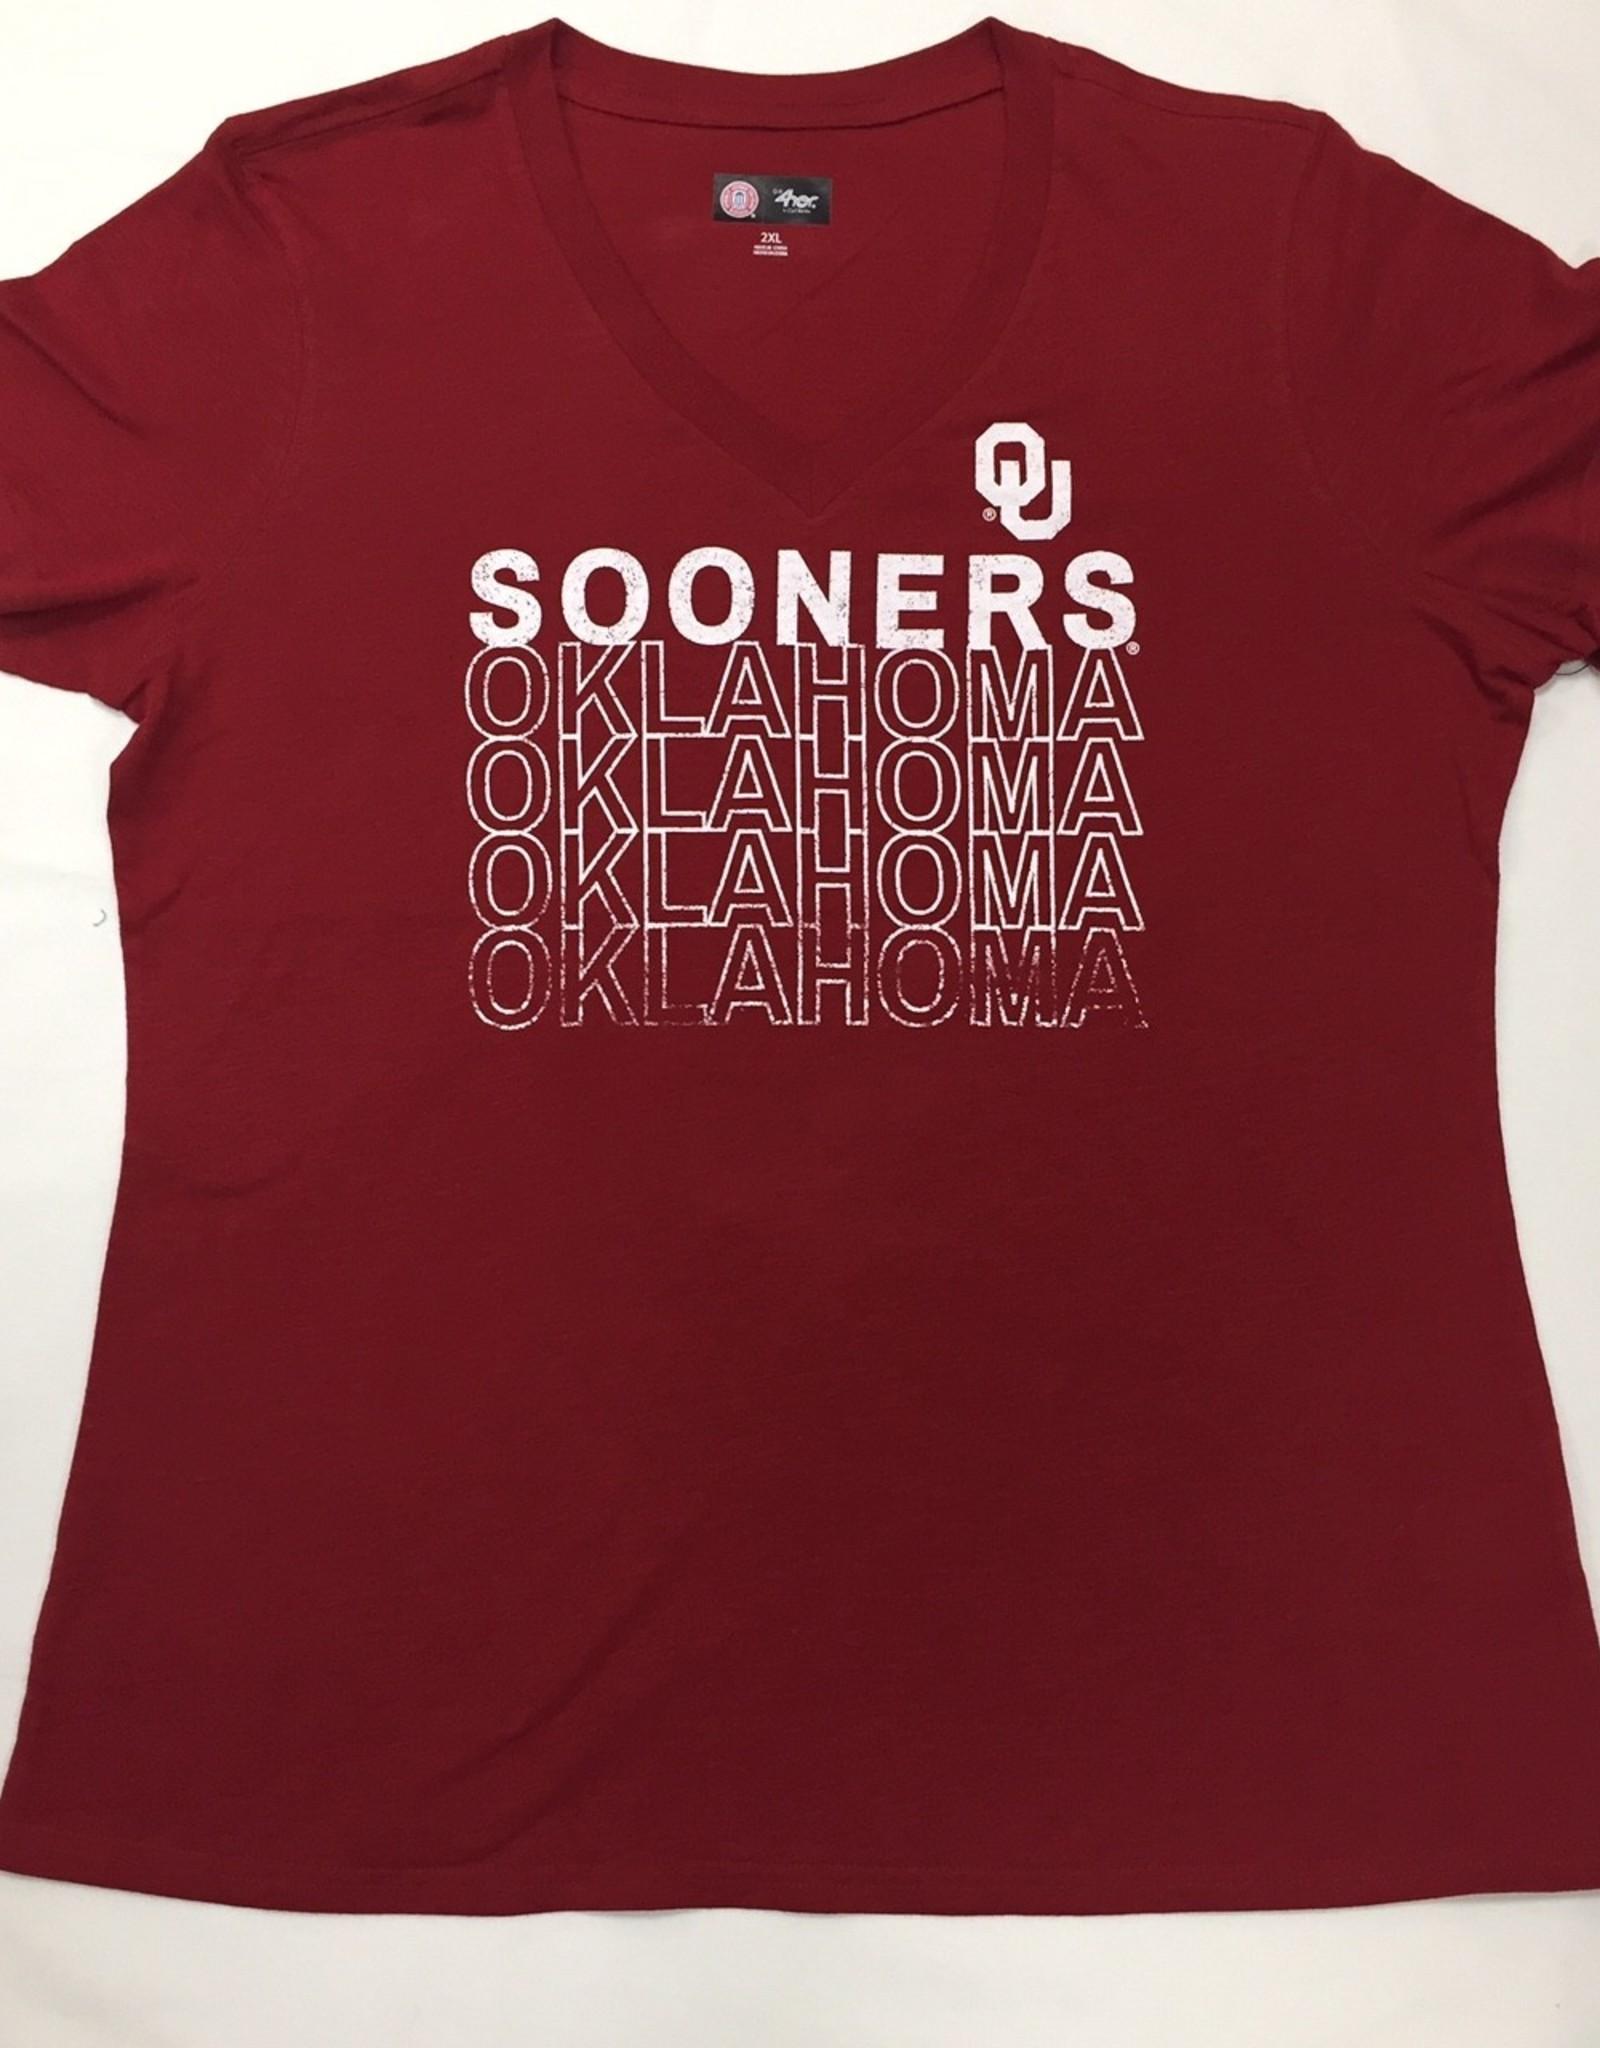 GIII Women's GIII OU Sooners Oklahoma V-Neck S/S Tee